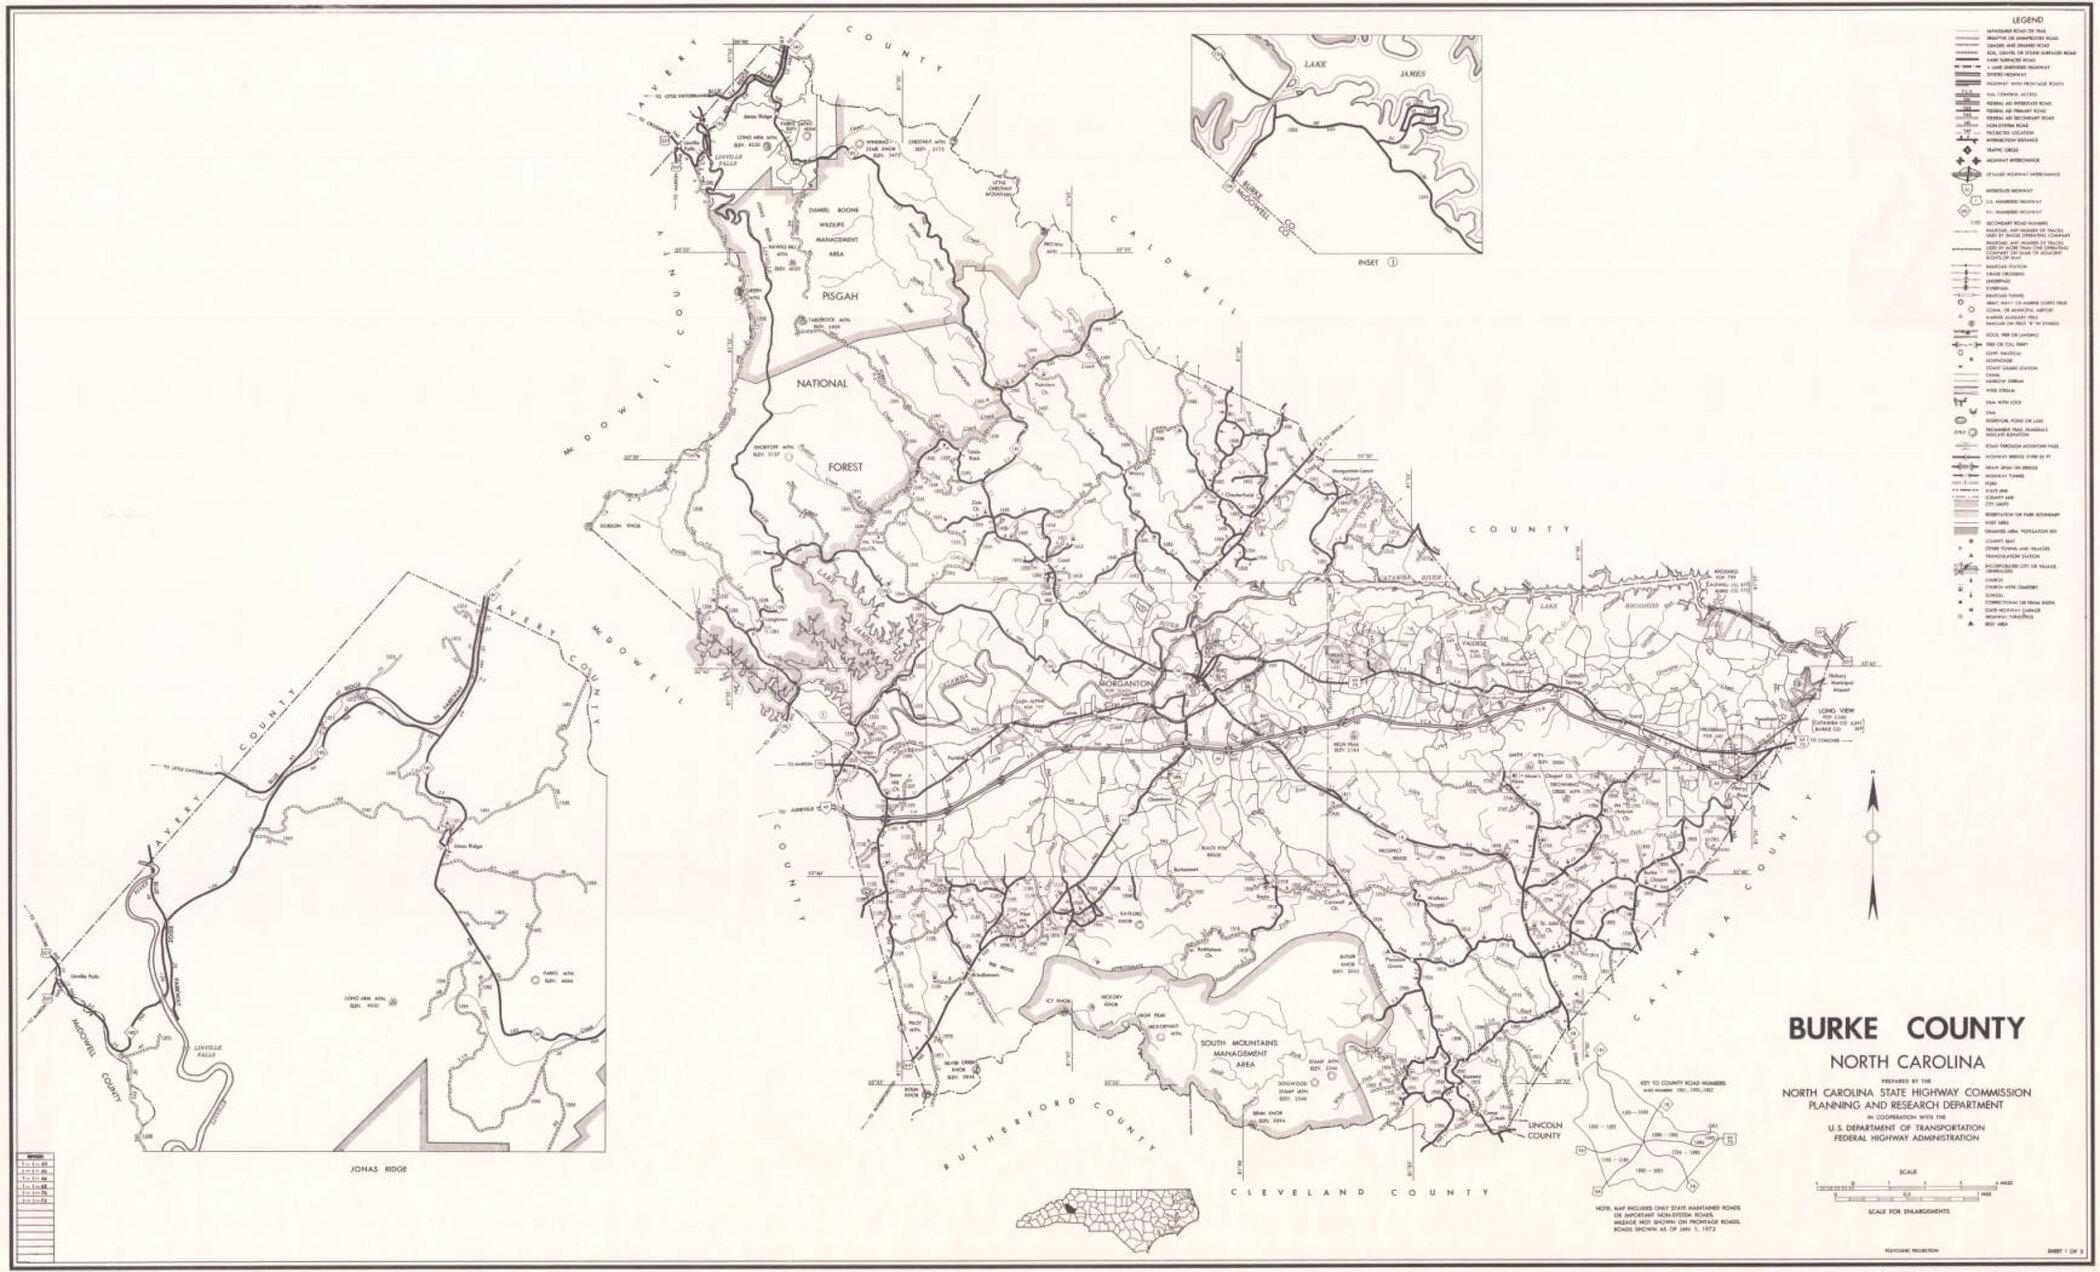 Burke_County_Road_Map_1972.jpg